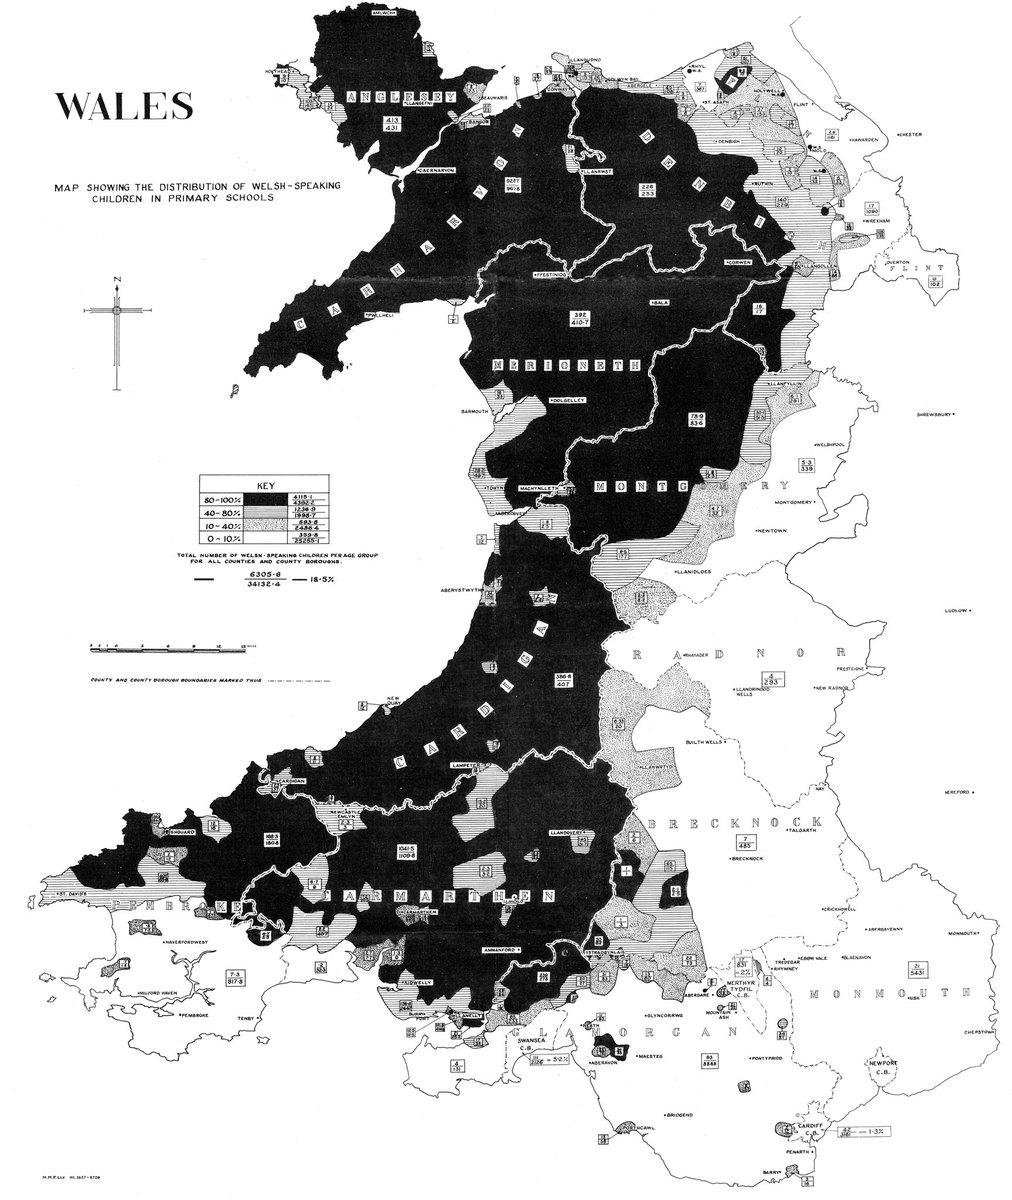 British Irish Language Maps On Twitter Siaradwyr Cymraeg - Welsh language map